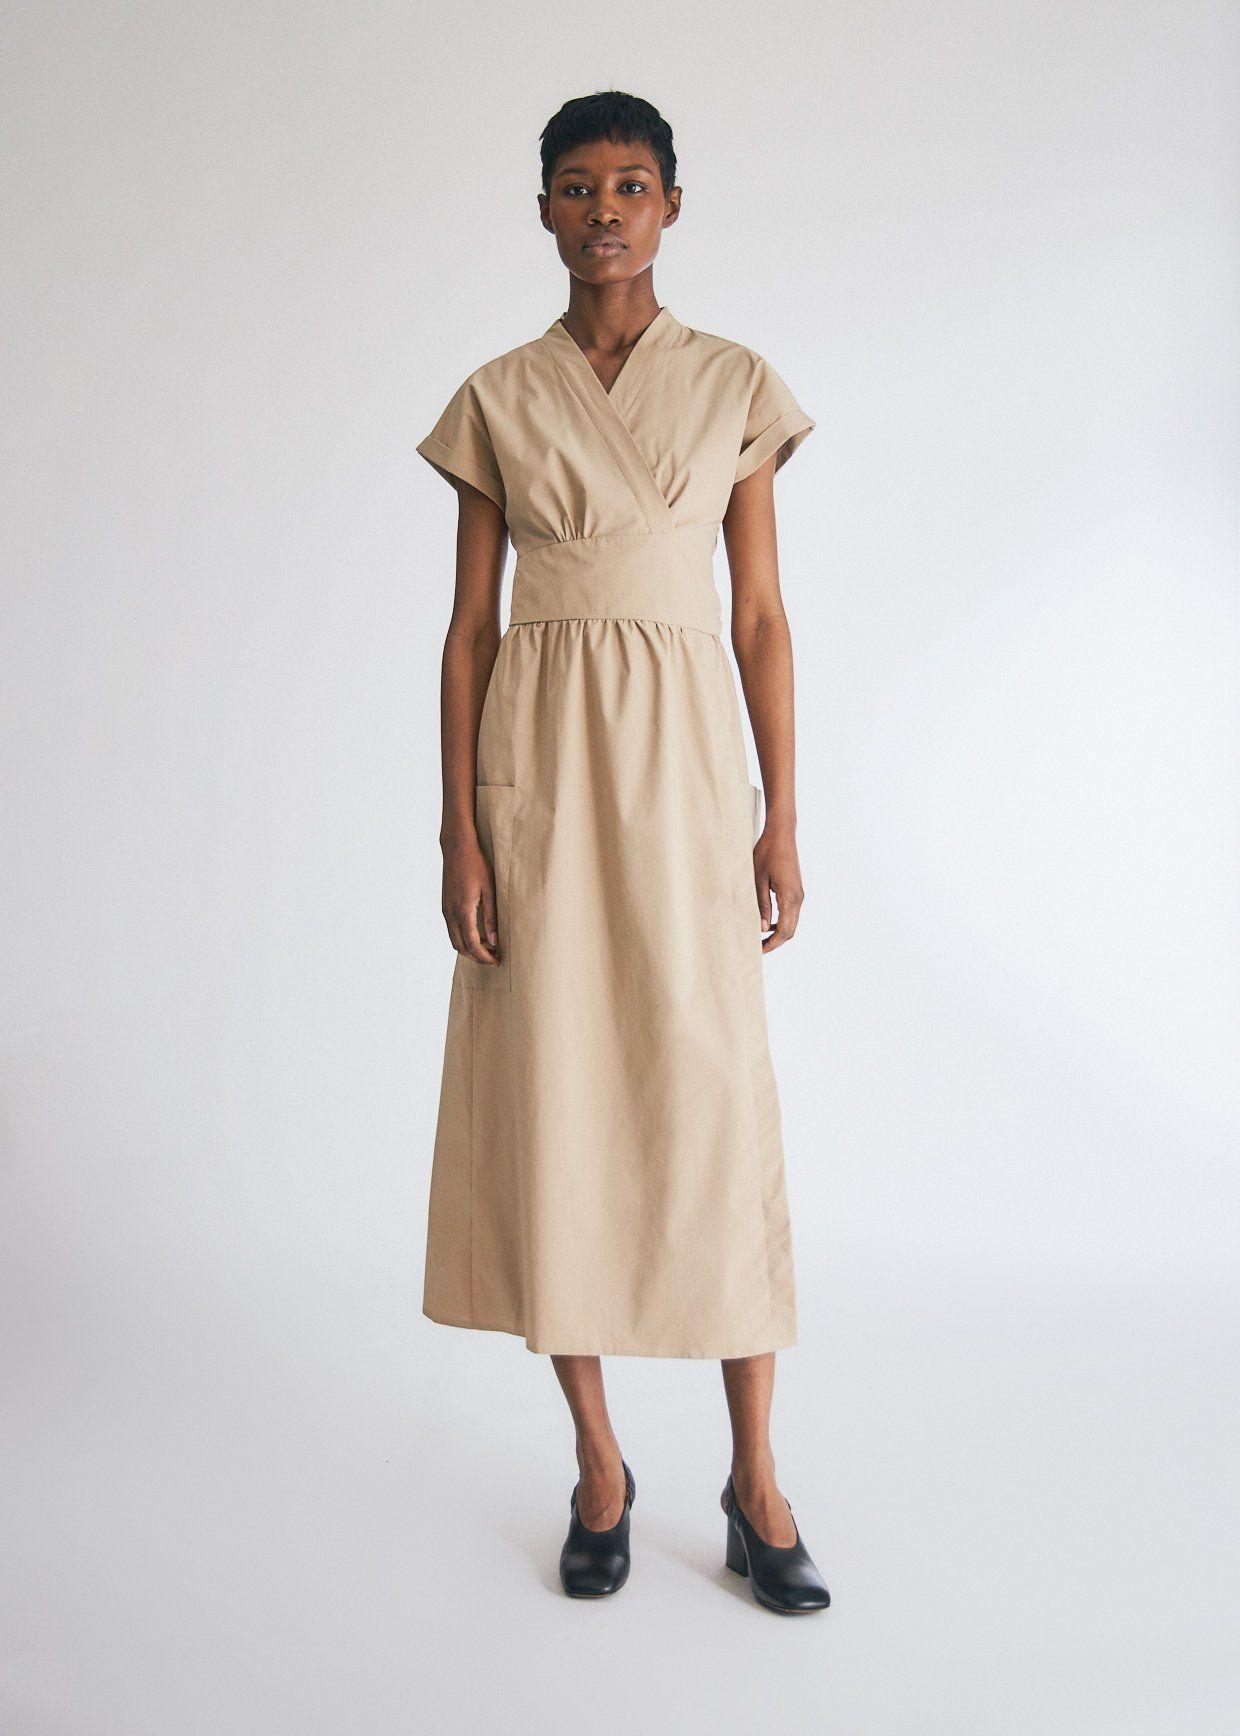 Need Garcia Wrap Dress In Tan Dresses Wrap Dress Tan Dresses [ 1736 x 1240 Pixel ]